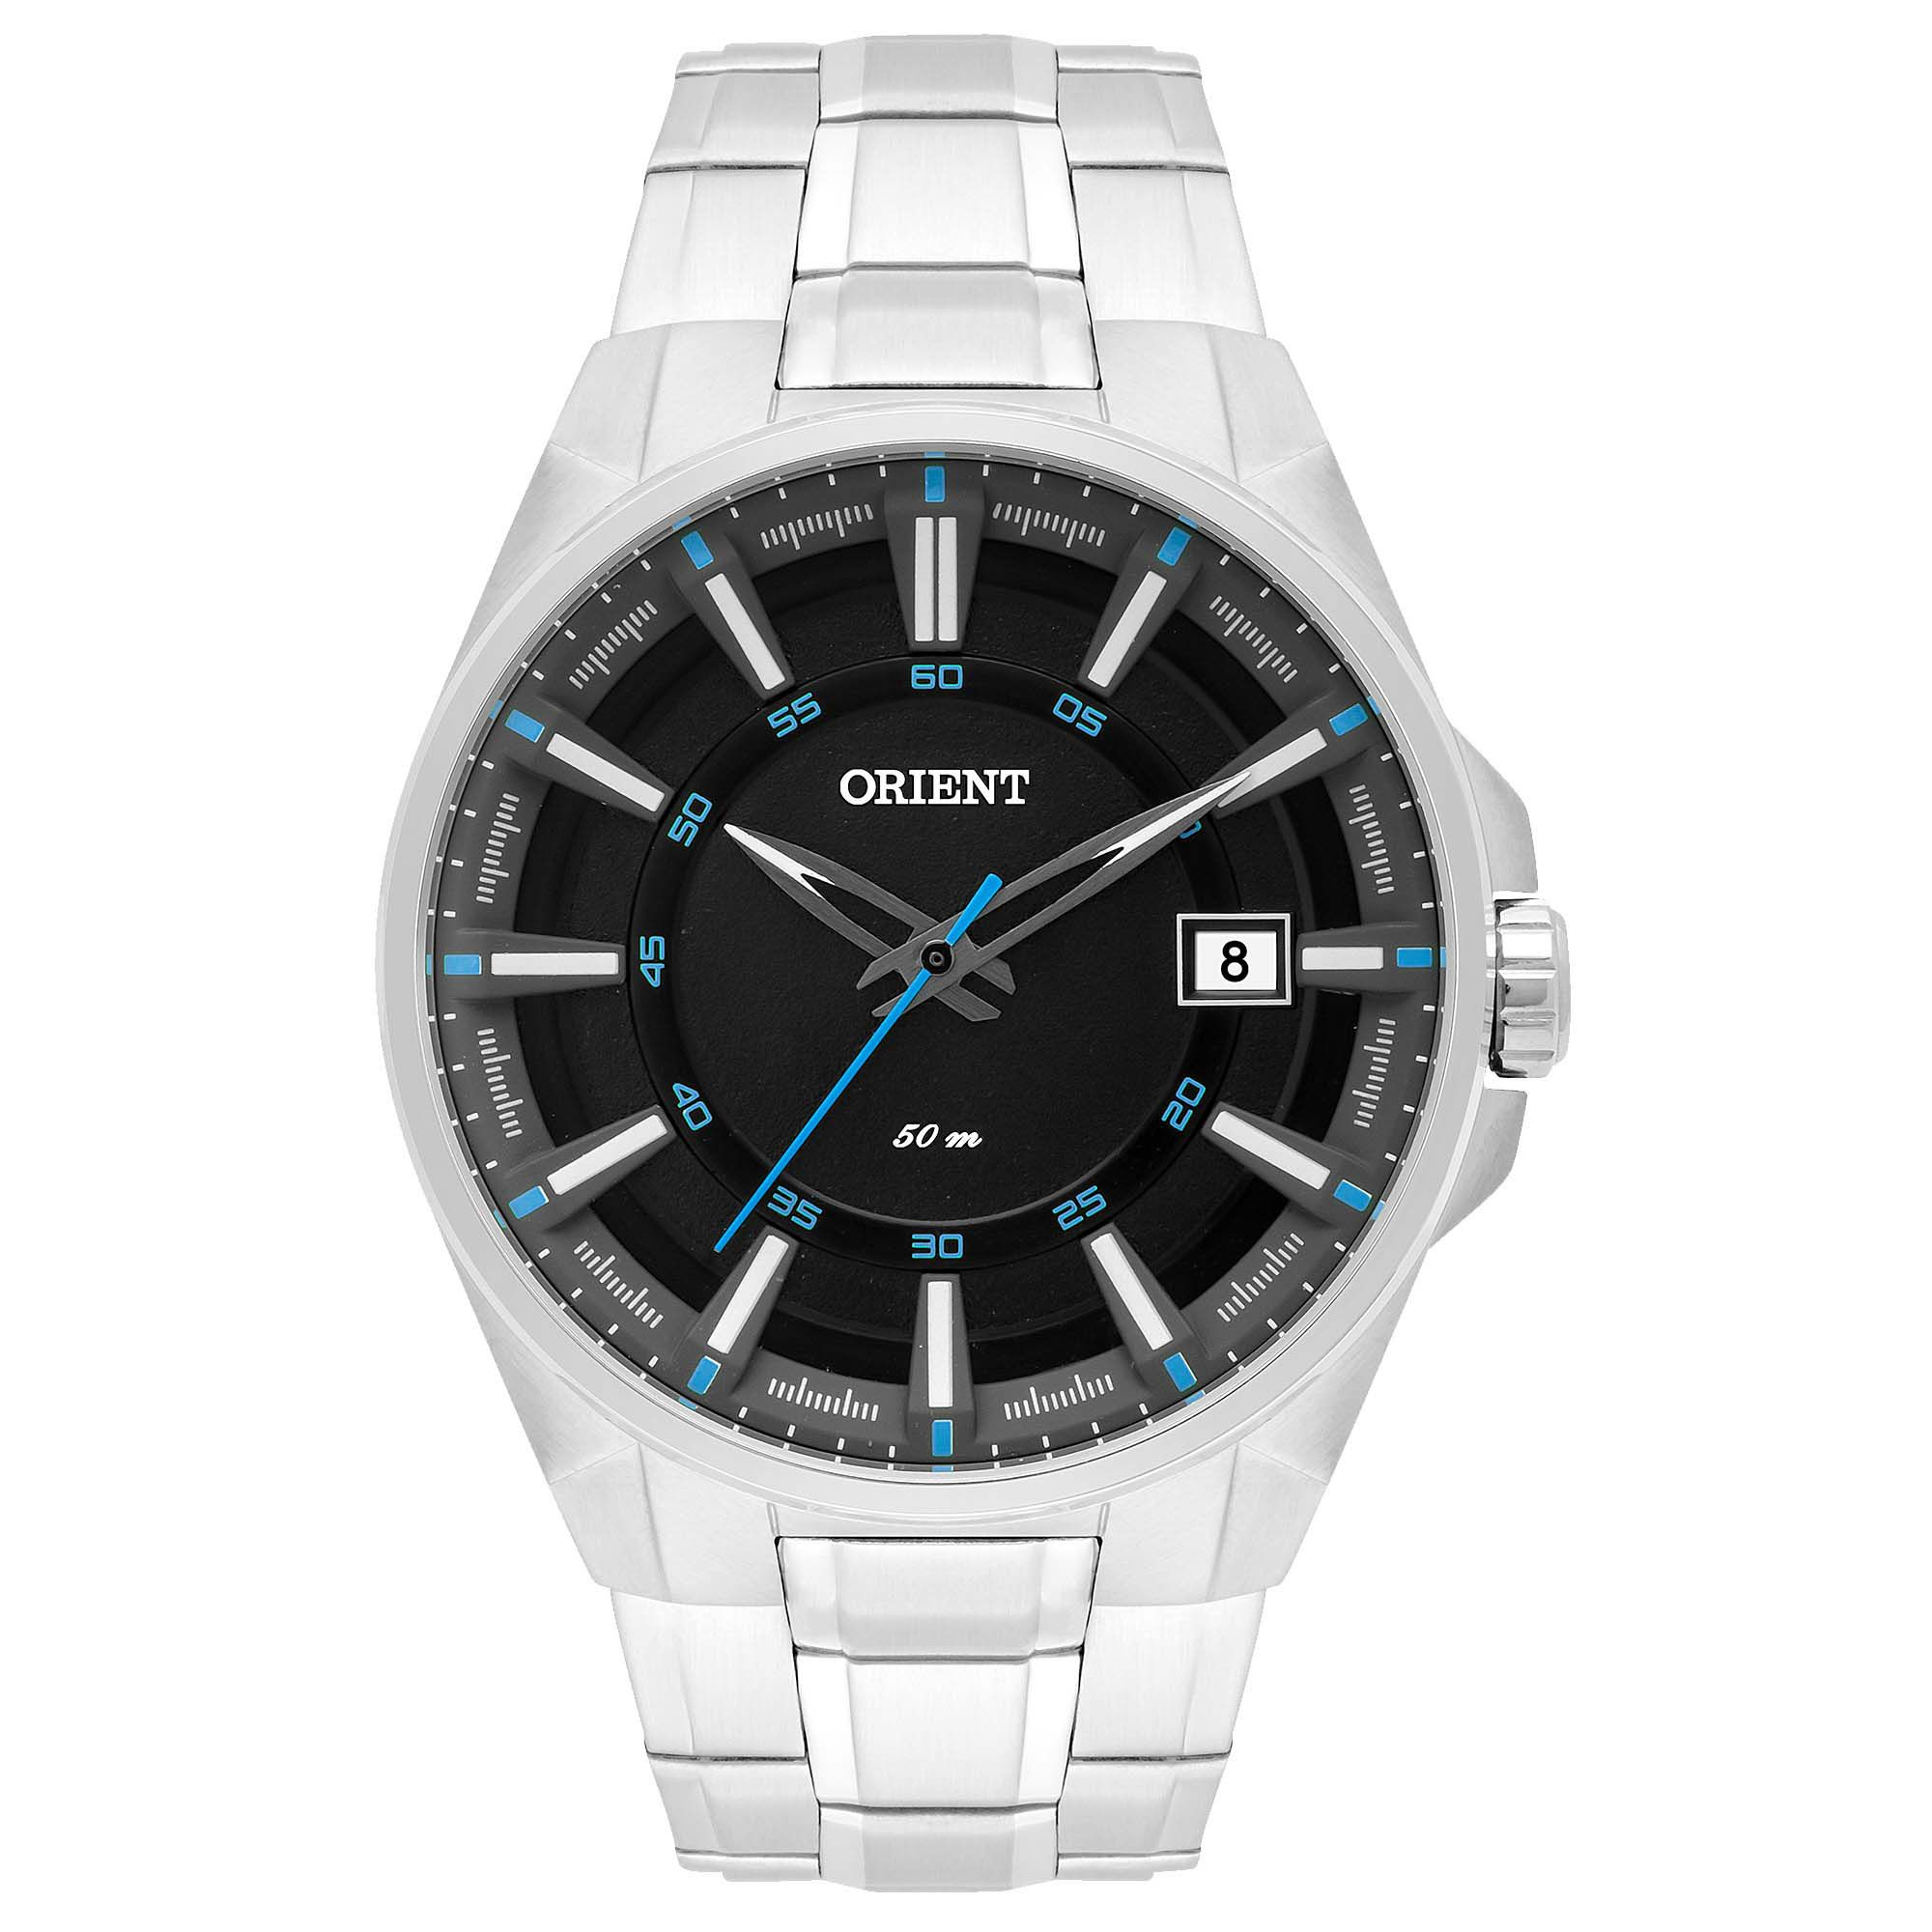 Relógio Masculino Orient MBSS1313 PASX